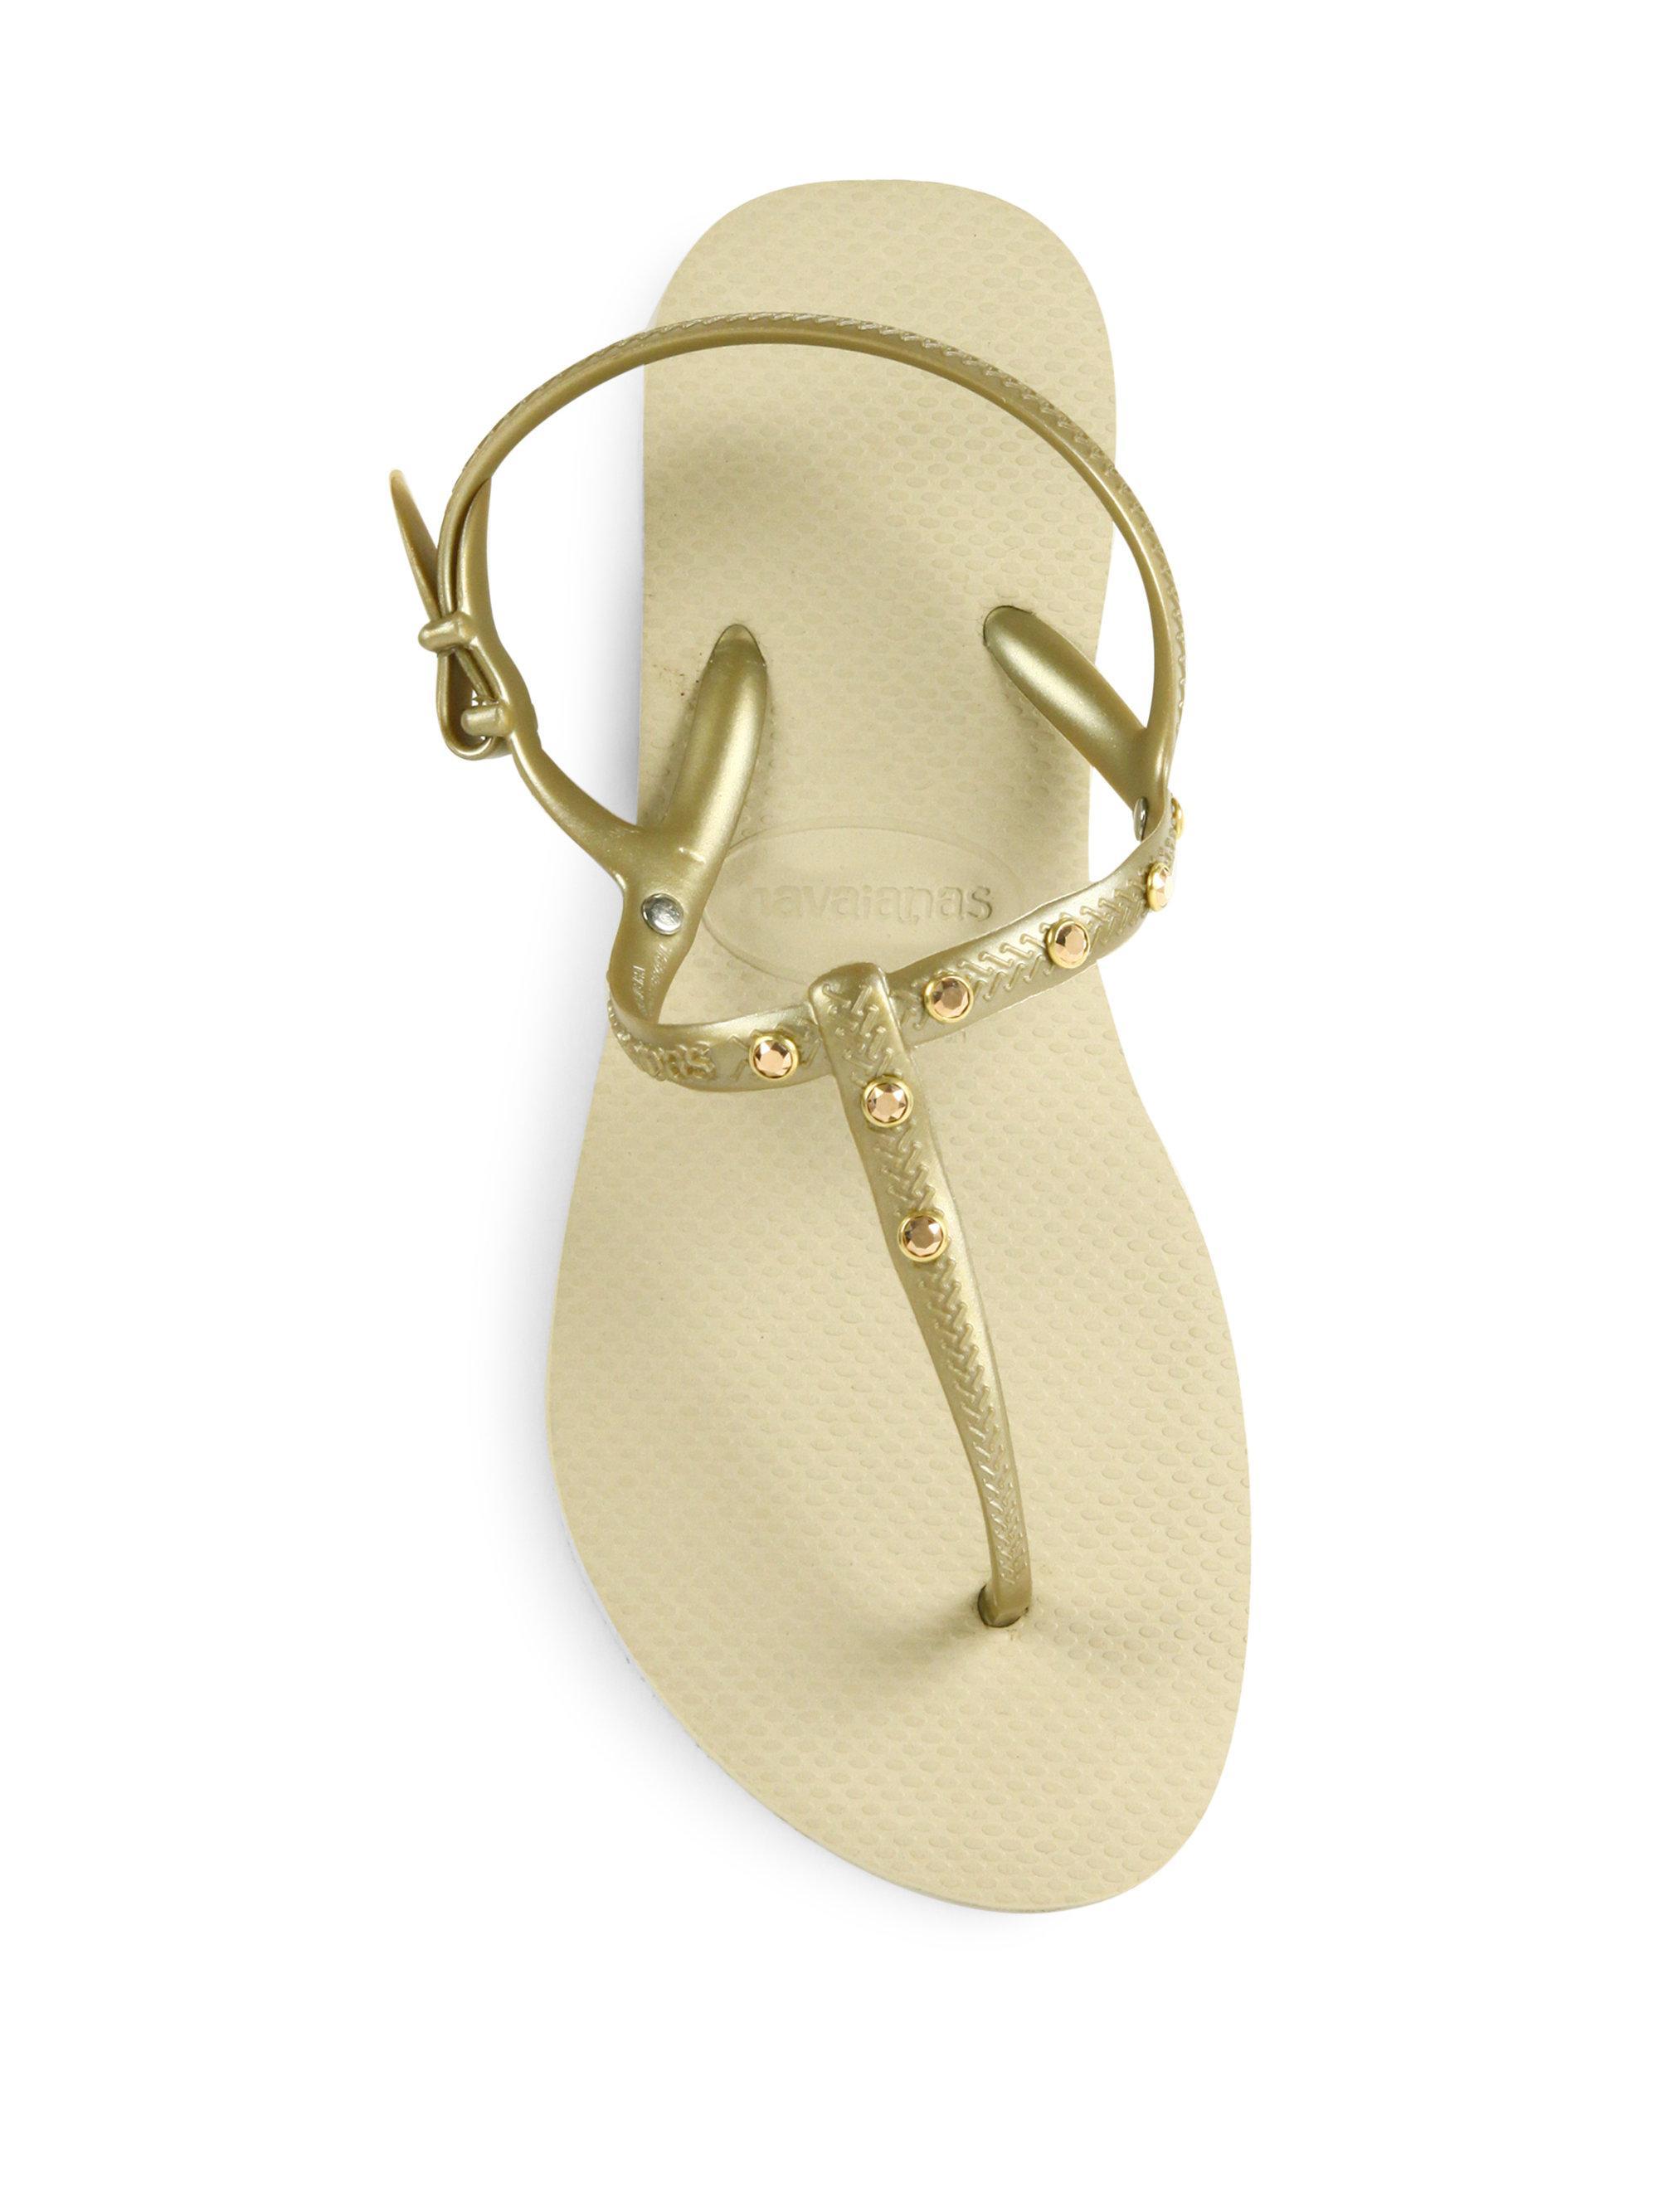 fd71bde8bfb5 Lyst - Havaianas Freedom Crystal Swarovski Slingback Sandals